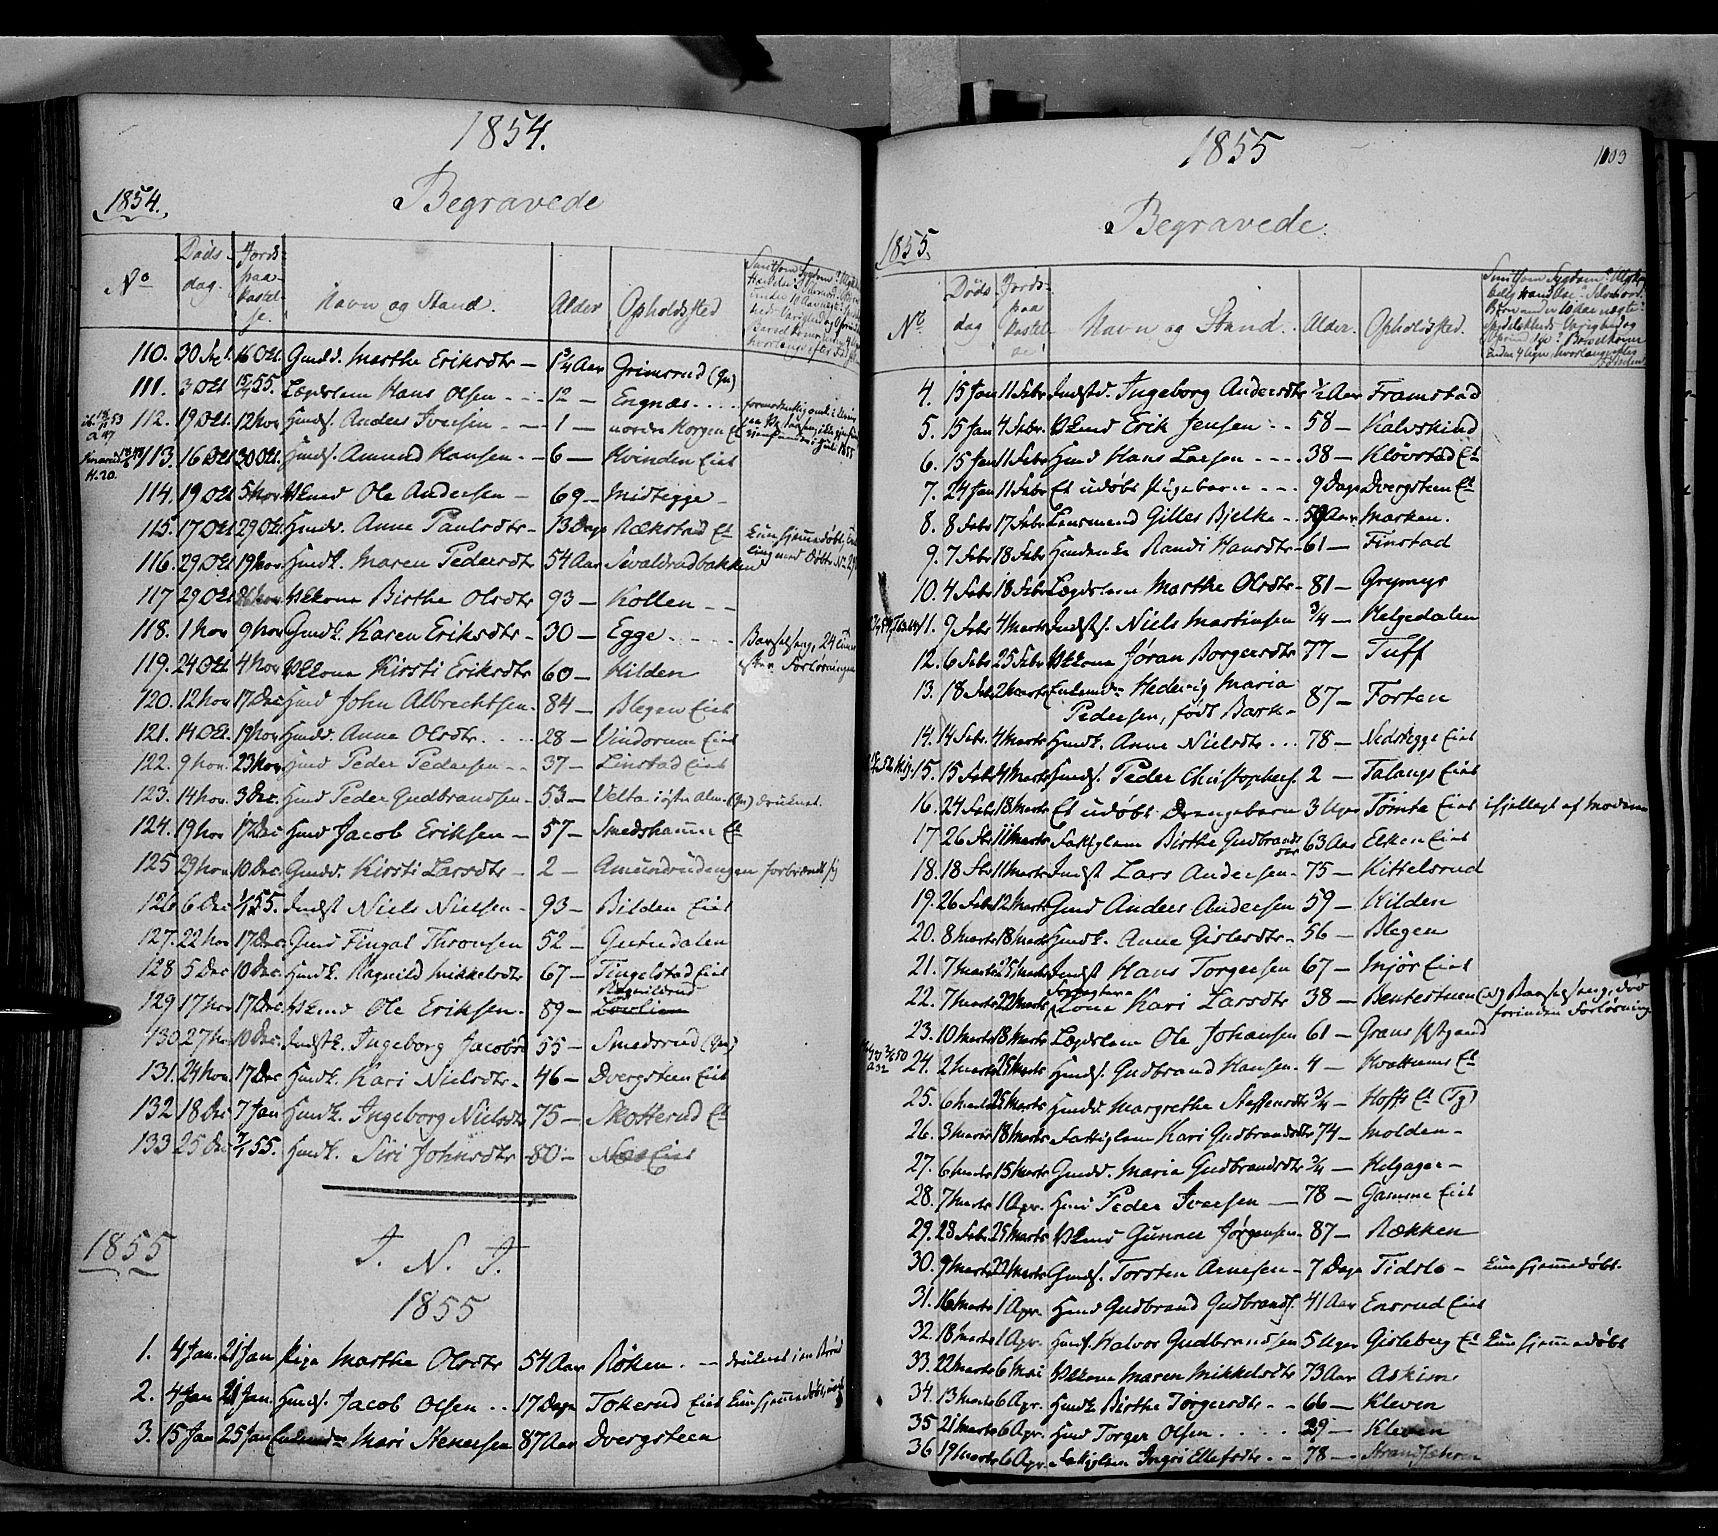 SAH, Gran prestekontor, Ministerialbok nr. 11, 1842-1856, s. 1102-1103